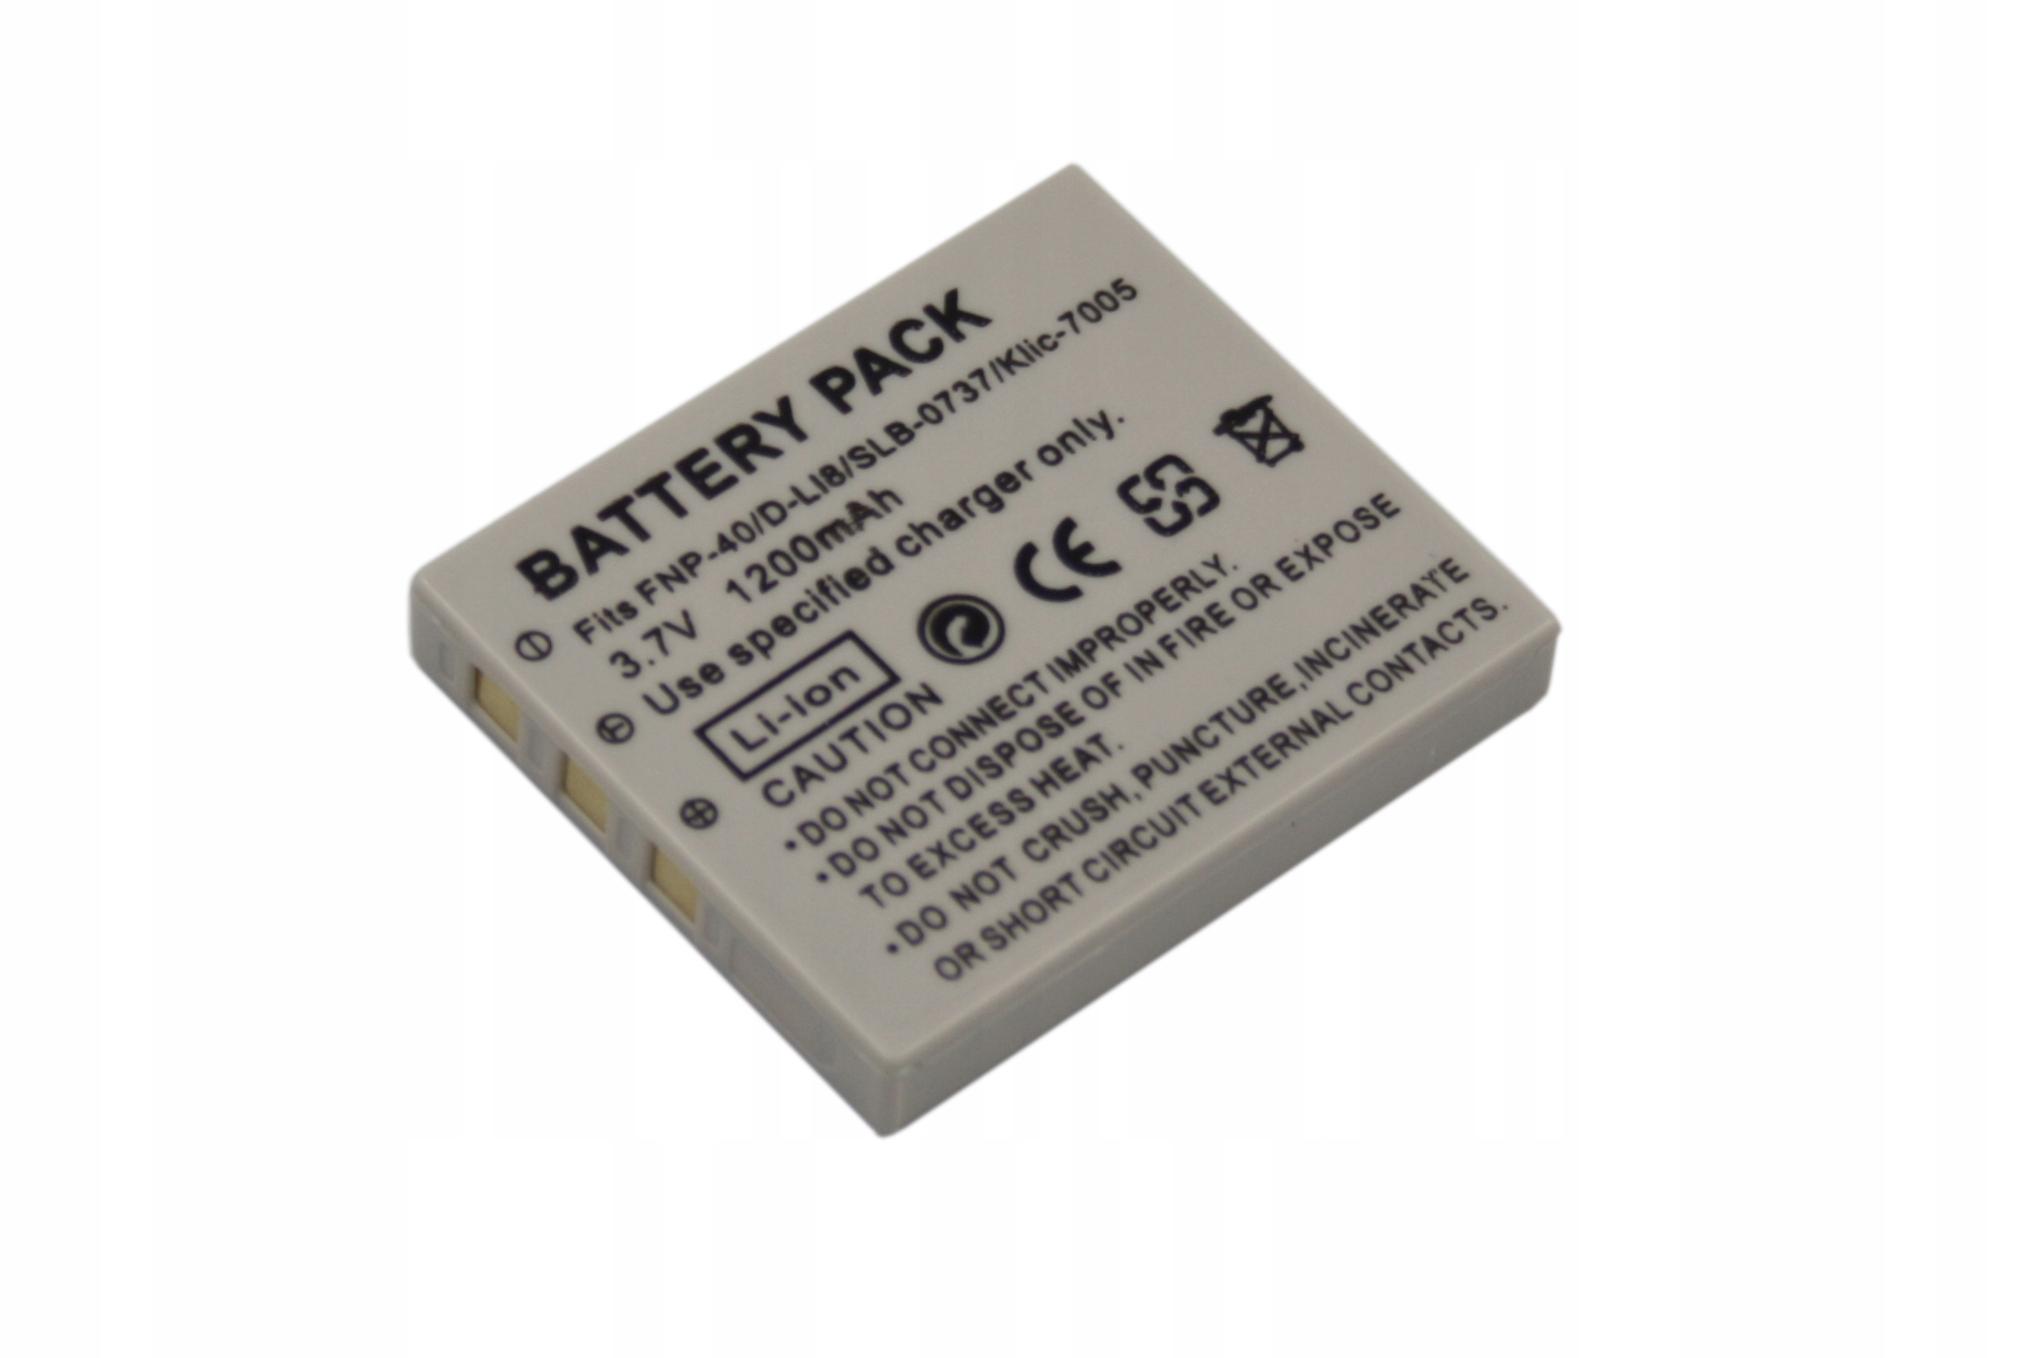 BATERIA AKUMULATOR FUJI NP-40 D-LI8 NP-1 SLB-0837 SLB-0737 - Baterie do aparatów cyfrowych